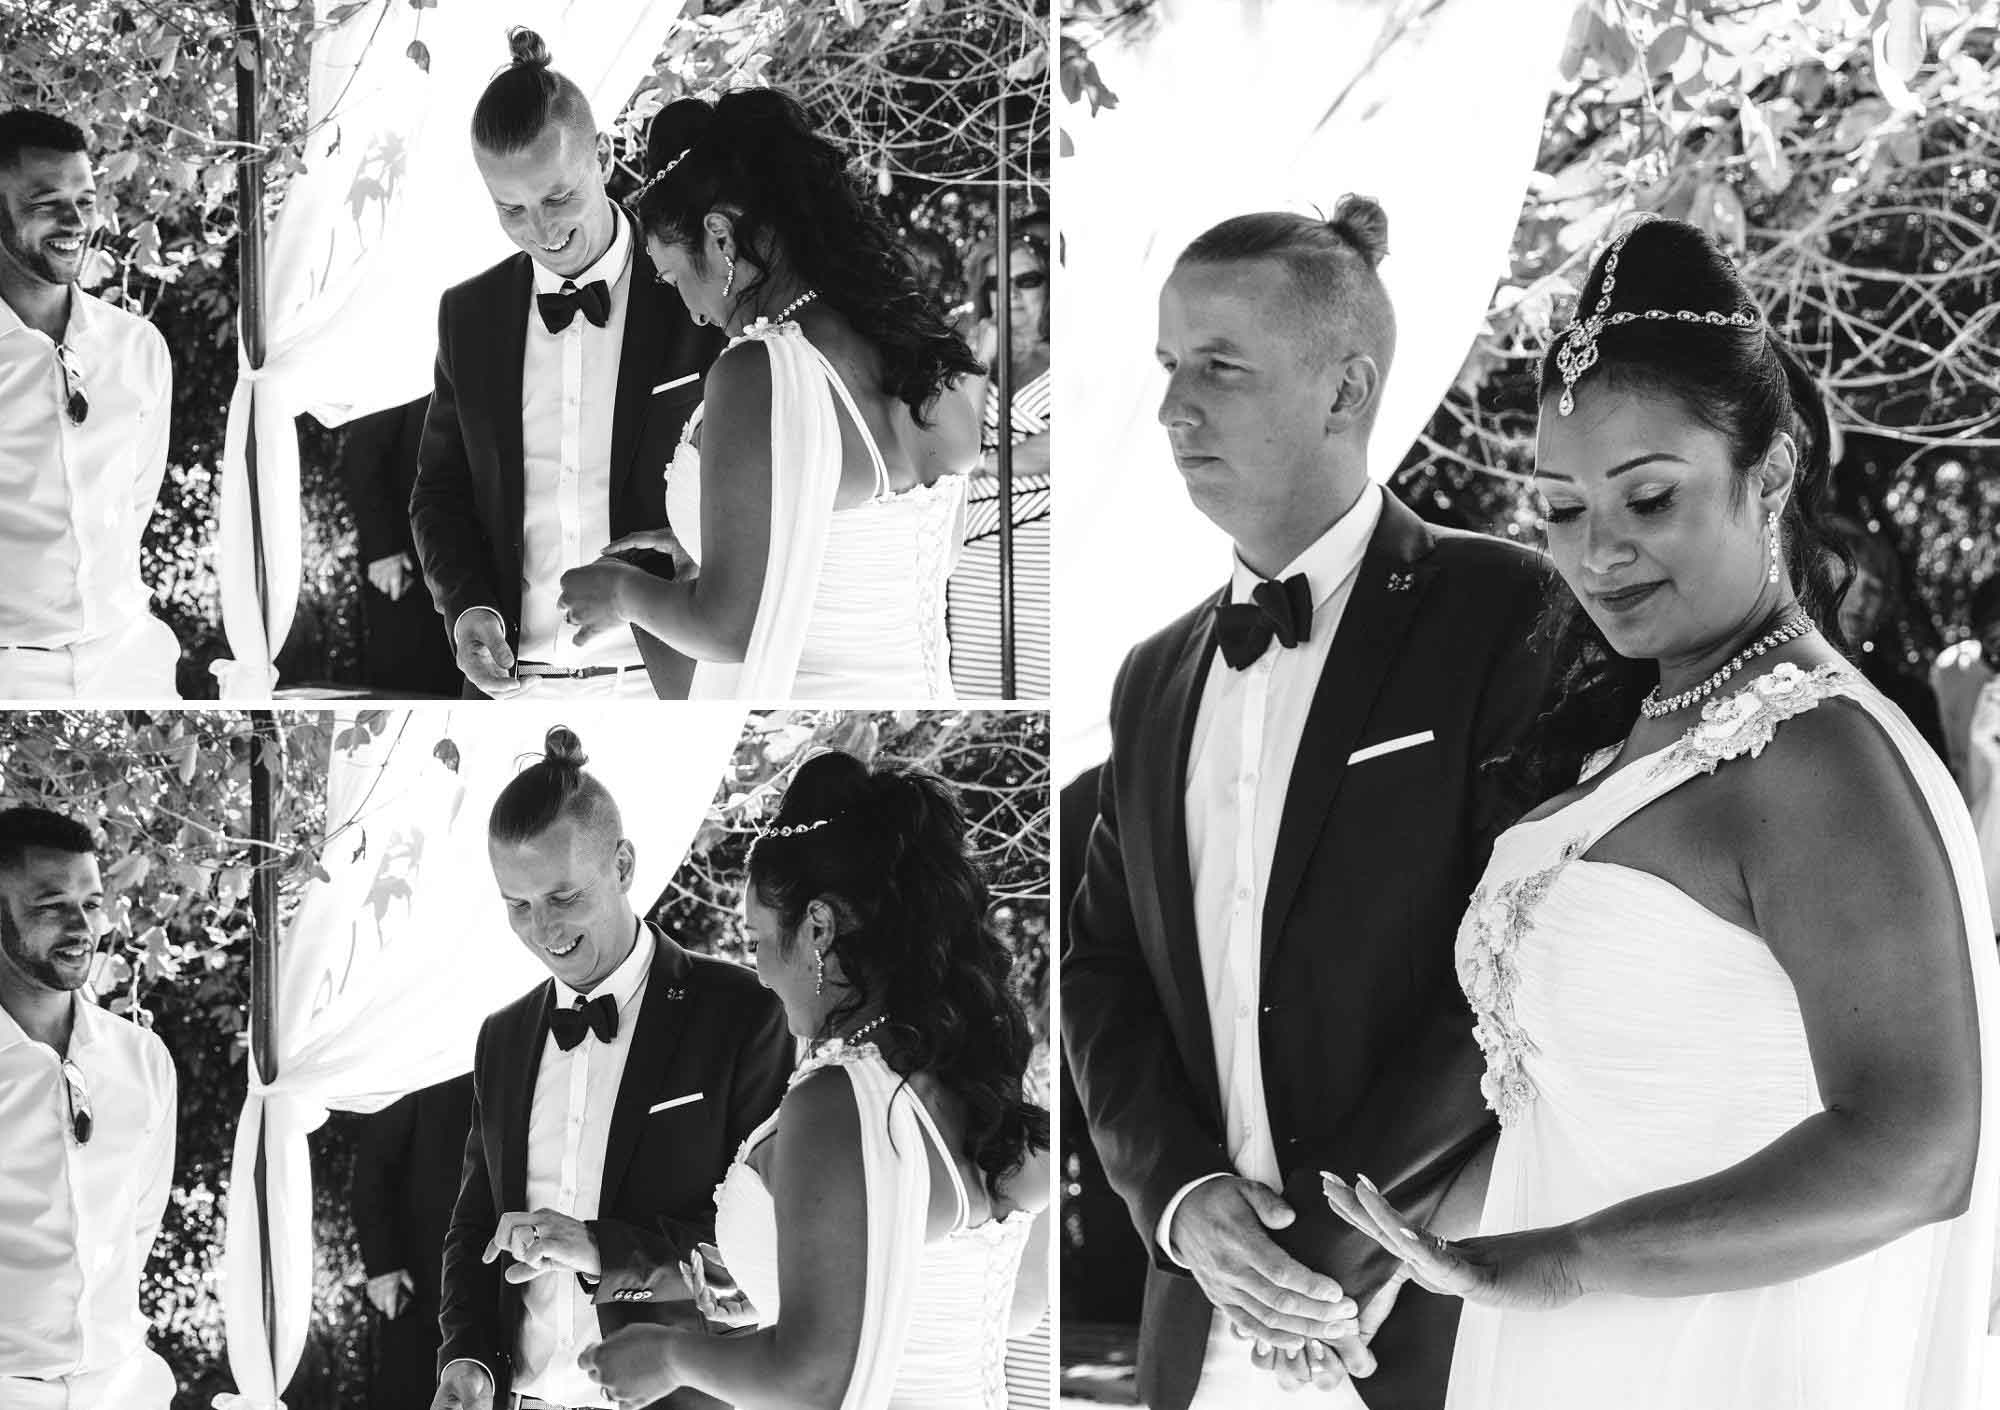 Portugal-Wedding-Photographer-69.jpg